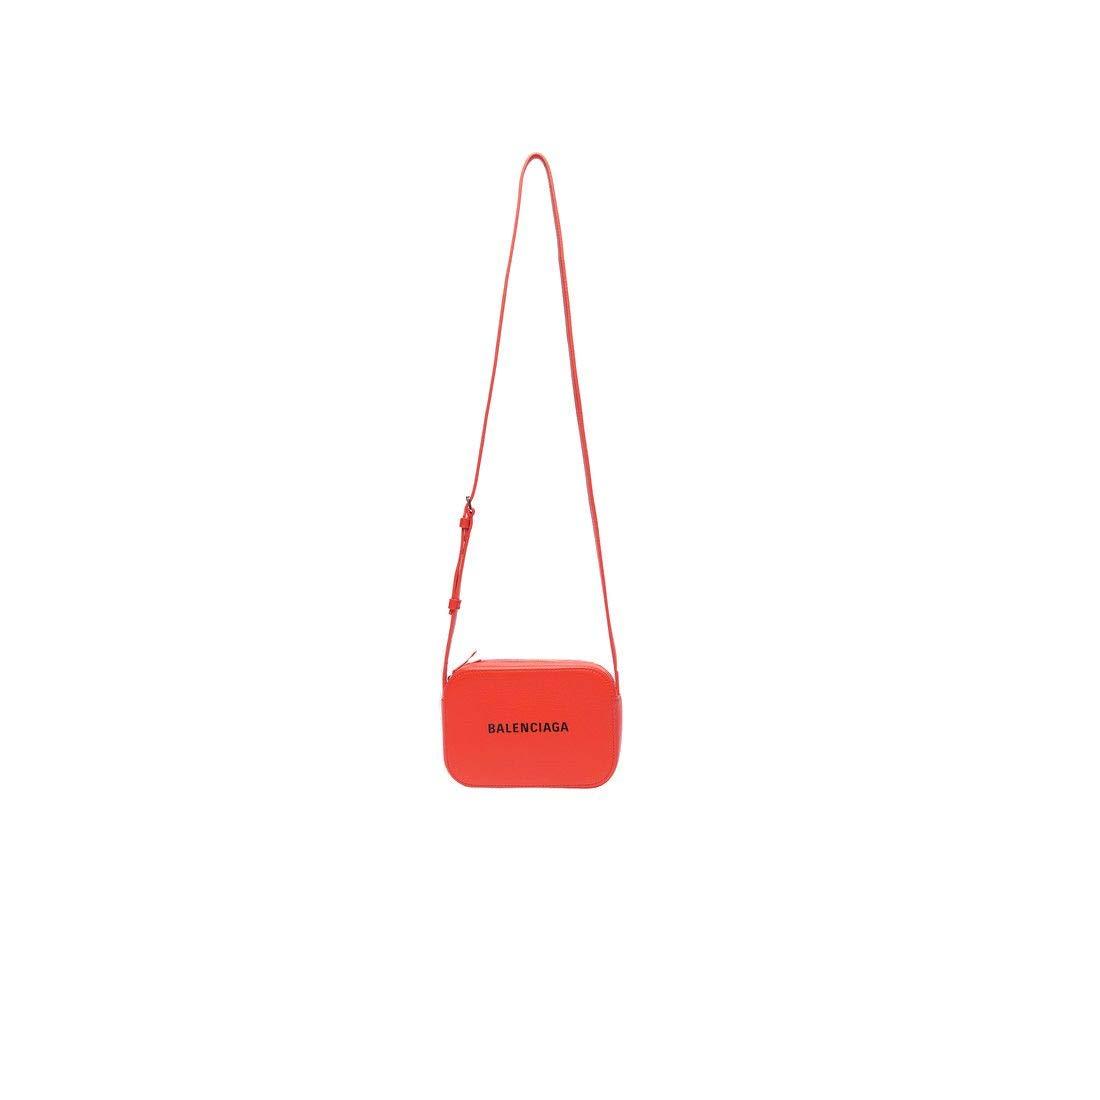 65d0bbea140af Amazon.com: Balenciaga Women's 552372Dlq4n6561 Red Leather Shoulder ...